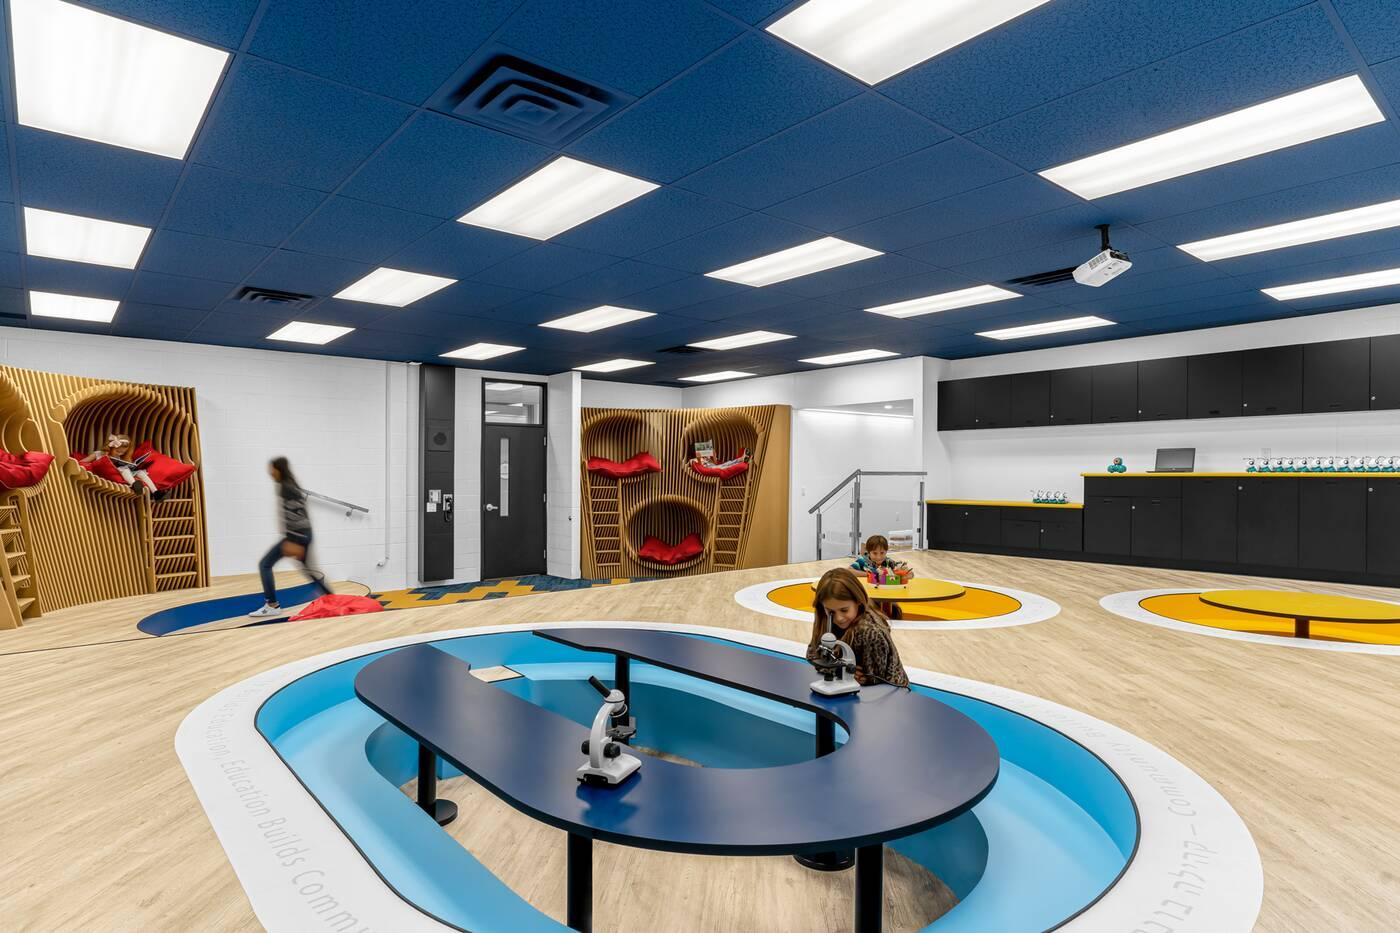 grossman family design studio